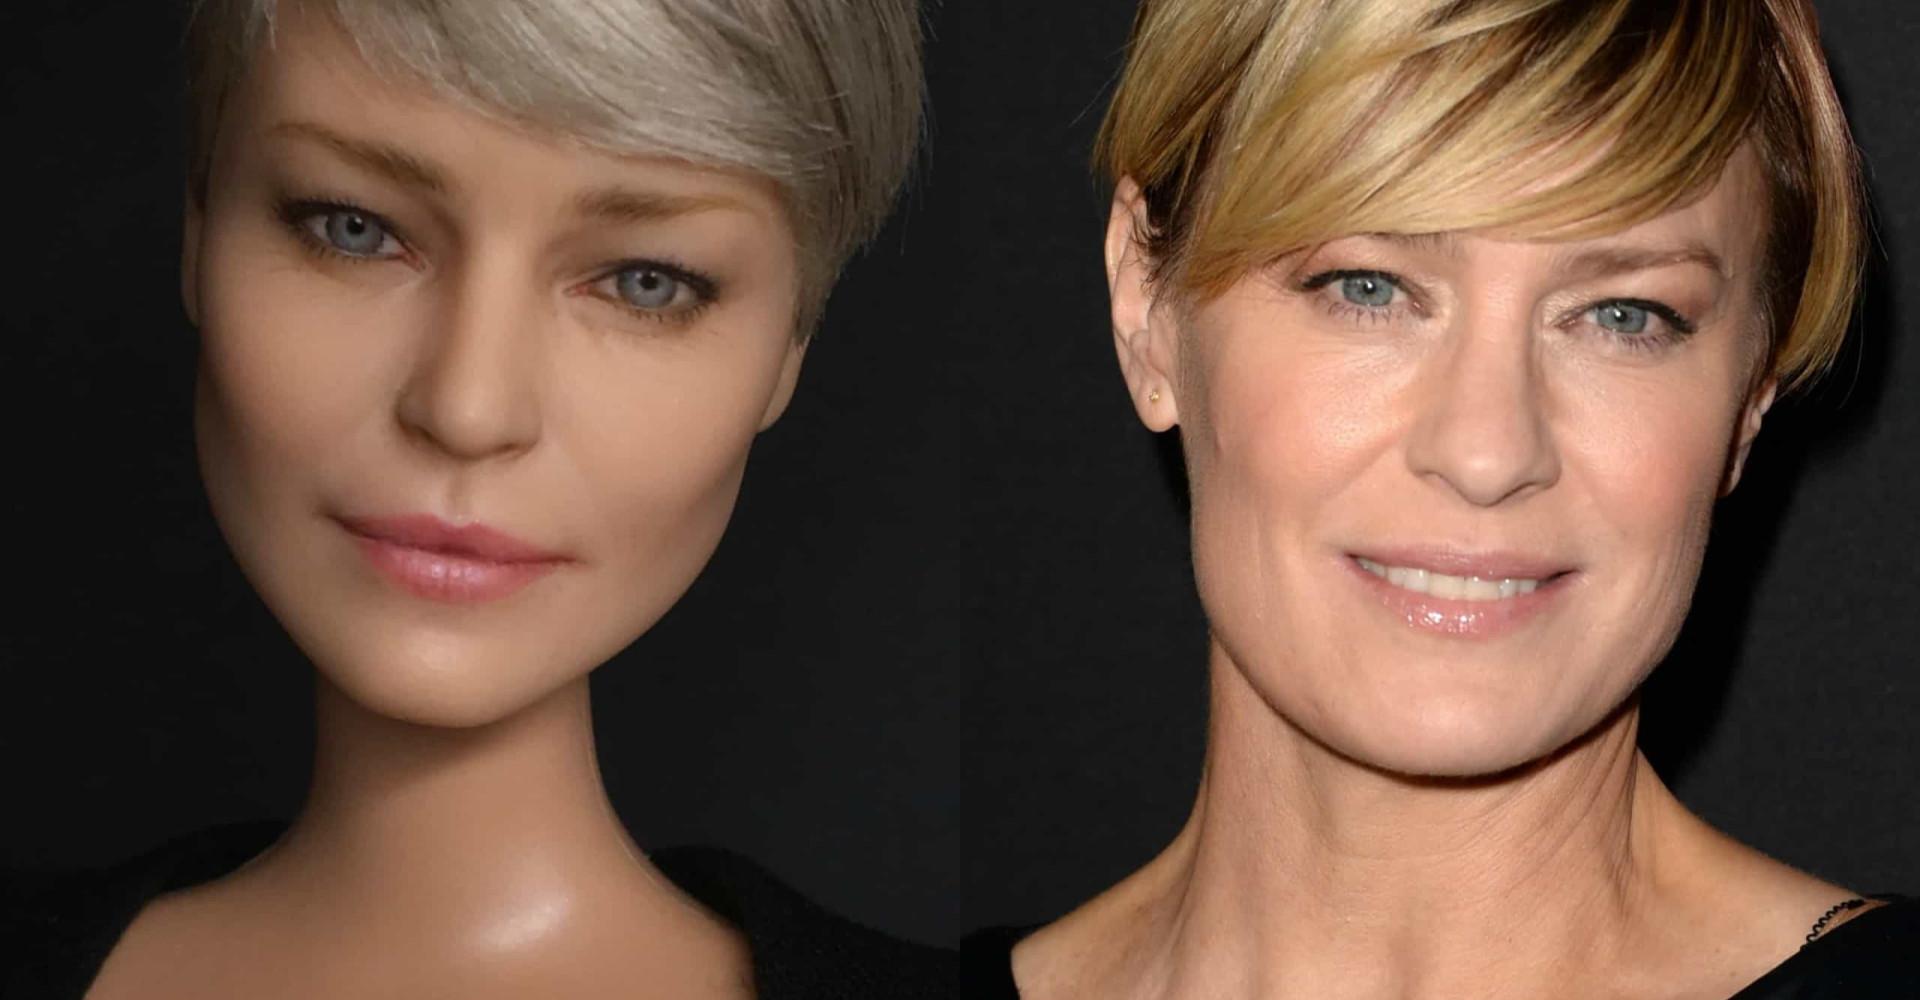 Muñecas hechas celebridades, ¡auténticas dobles!